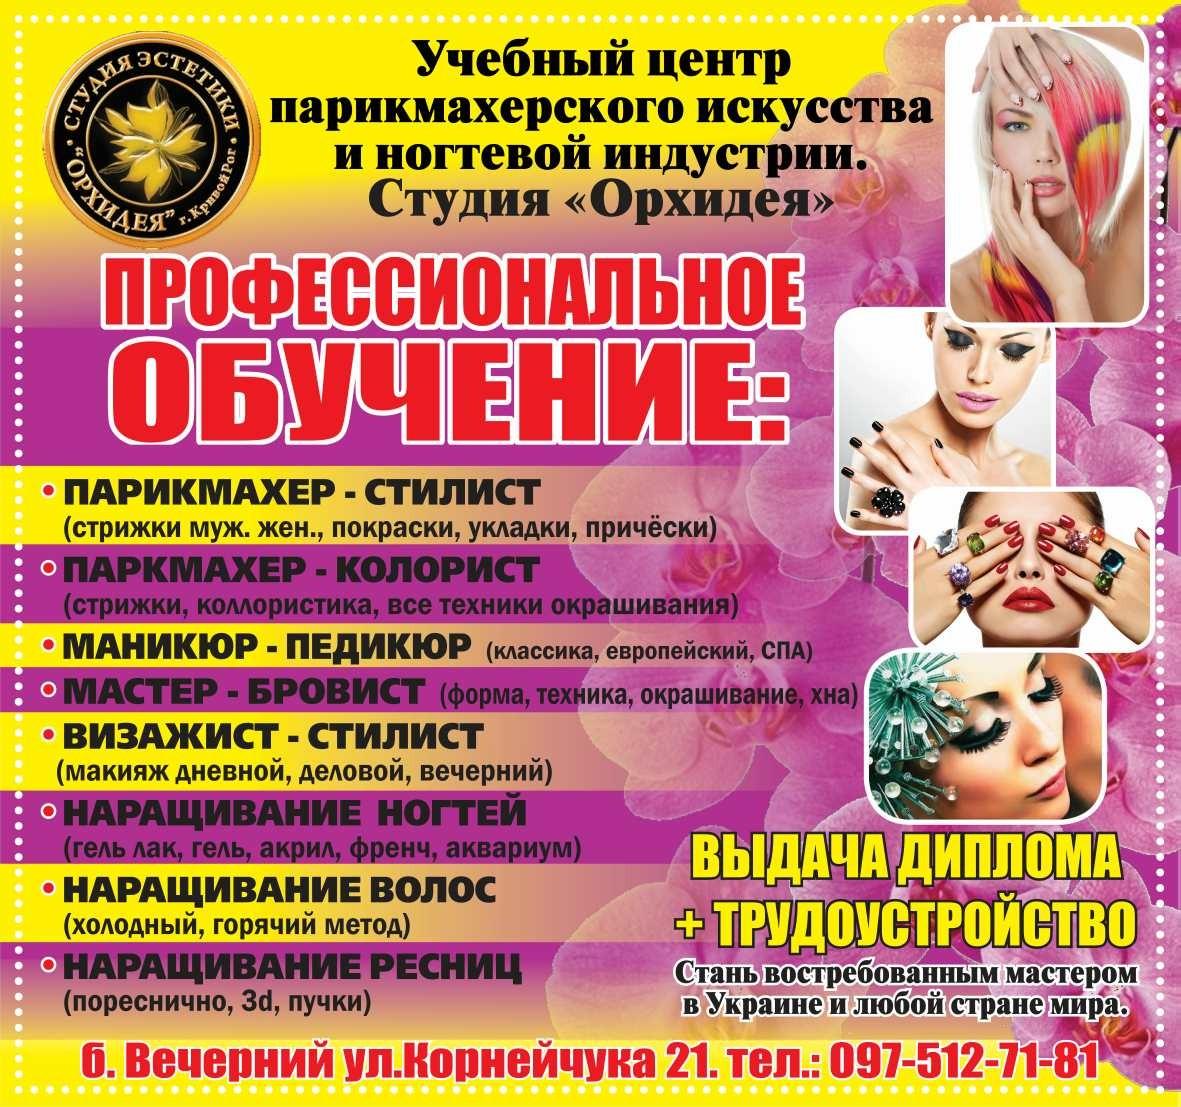 Курсы Визажист - стилист.